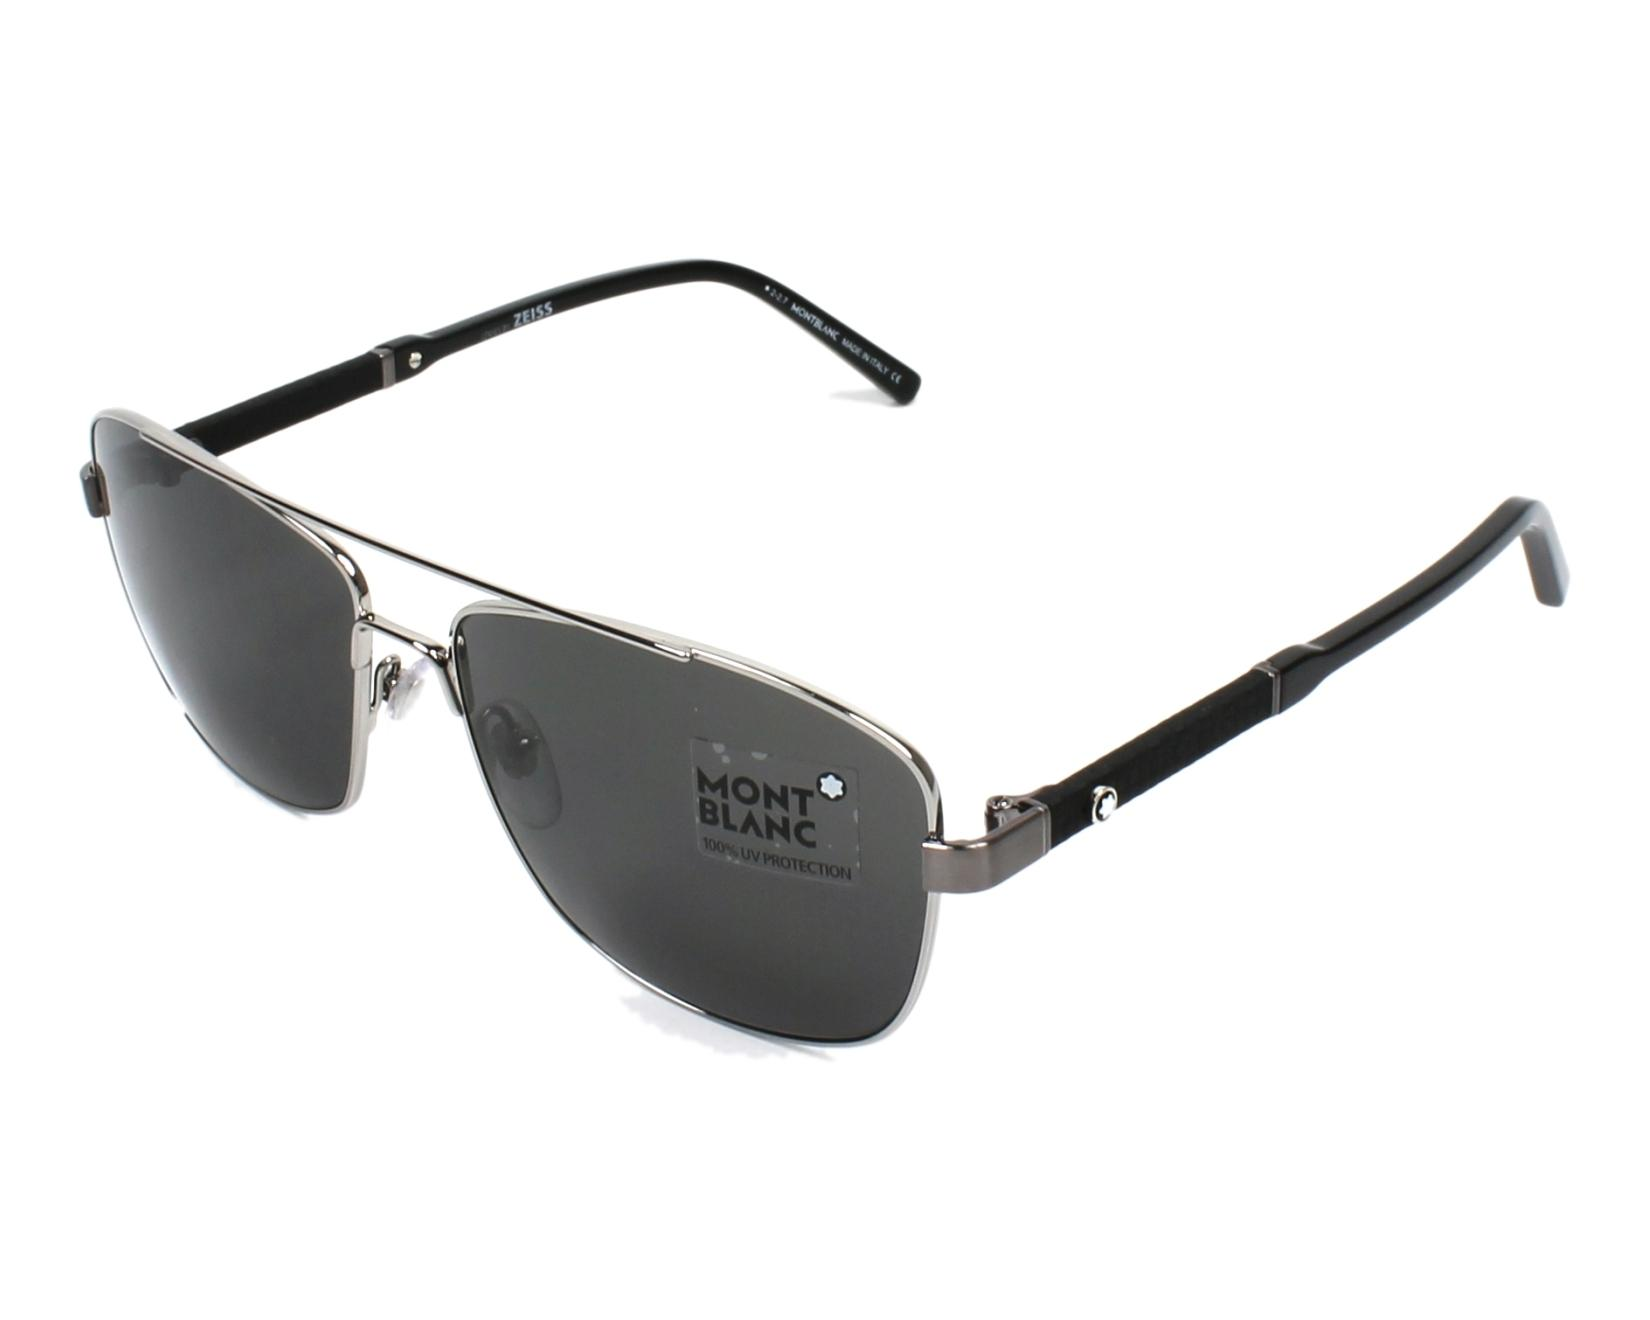 e726d937ea Sunglasses Mont Blanc MB-589-S 14A - Gun Black profile view